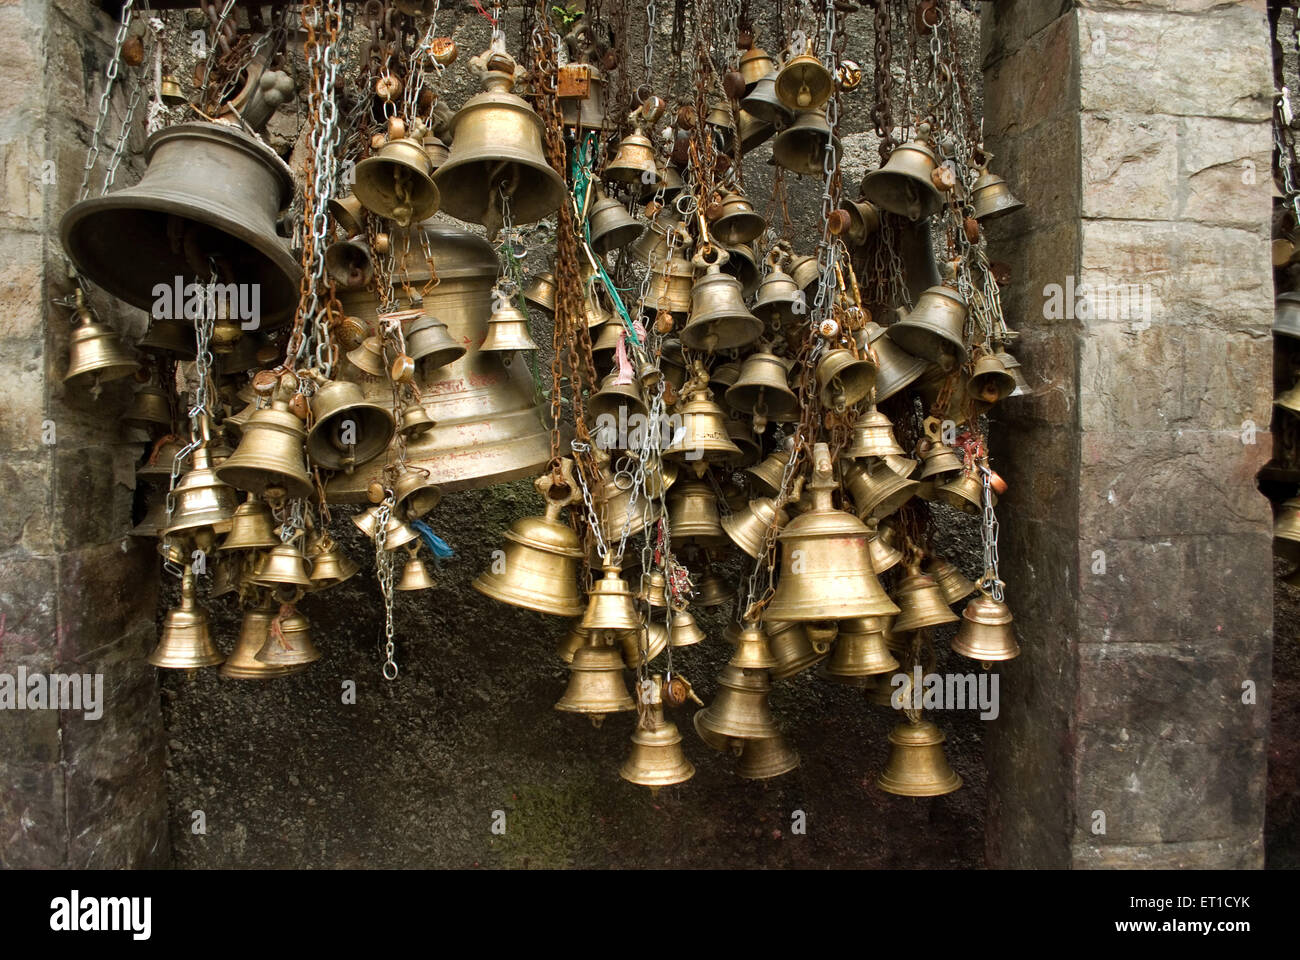 Bells of faith in kamakhya shaktipeeth temple Guwahati Assam India - Stock Image